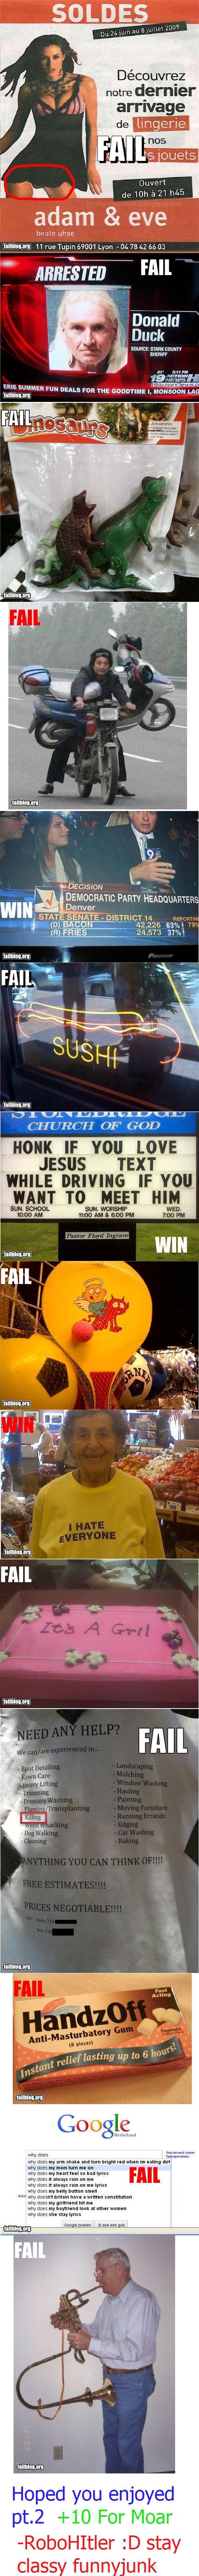 "Fail Comp. Pt. 2. fail comp pt 2<br /> pt1 /funny_pictures/589565/Fail+Comp+Pt+1/. u M gum in 819"" notre dealer adam & eve beats uhsa 11 we Tapin 67001 Ly fail blog comp funny"